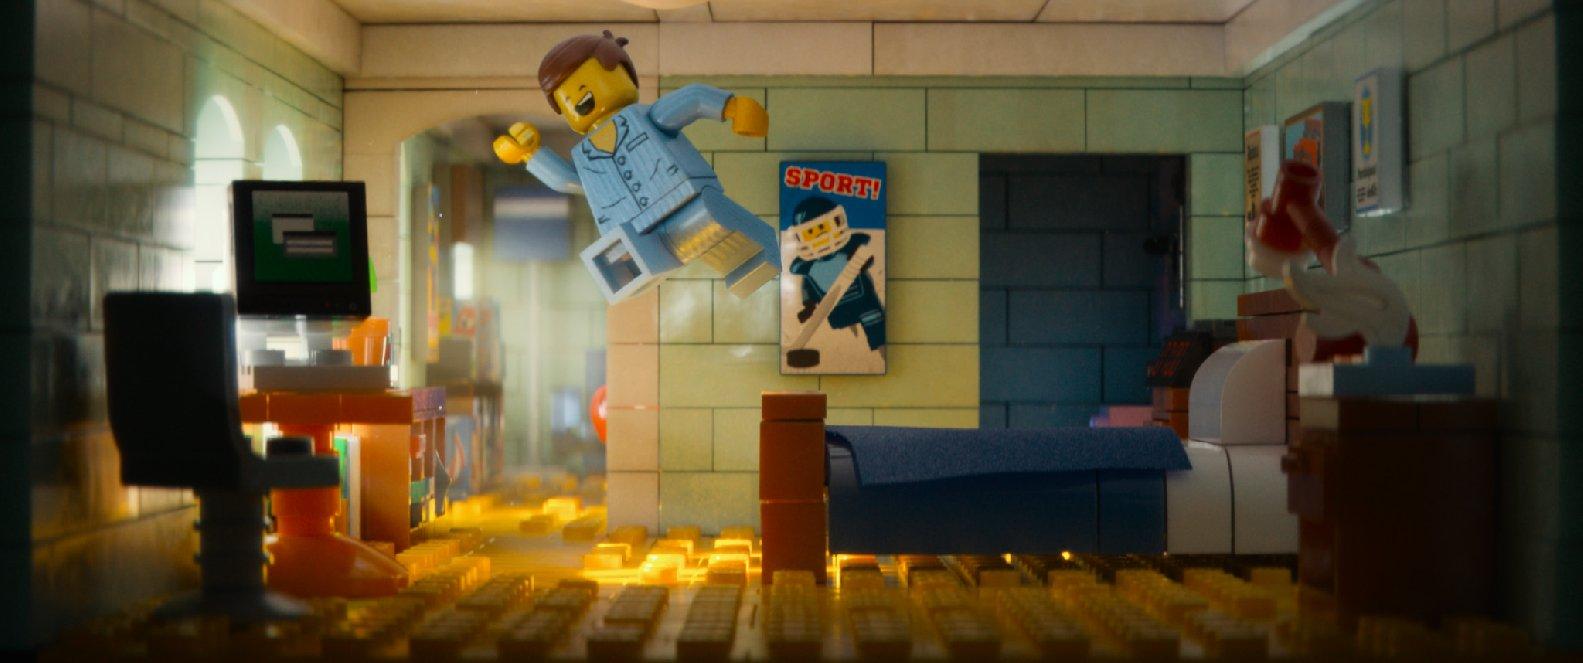 LEGO_jelenetfoto (25)